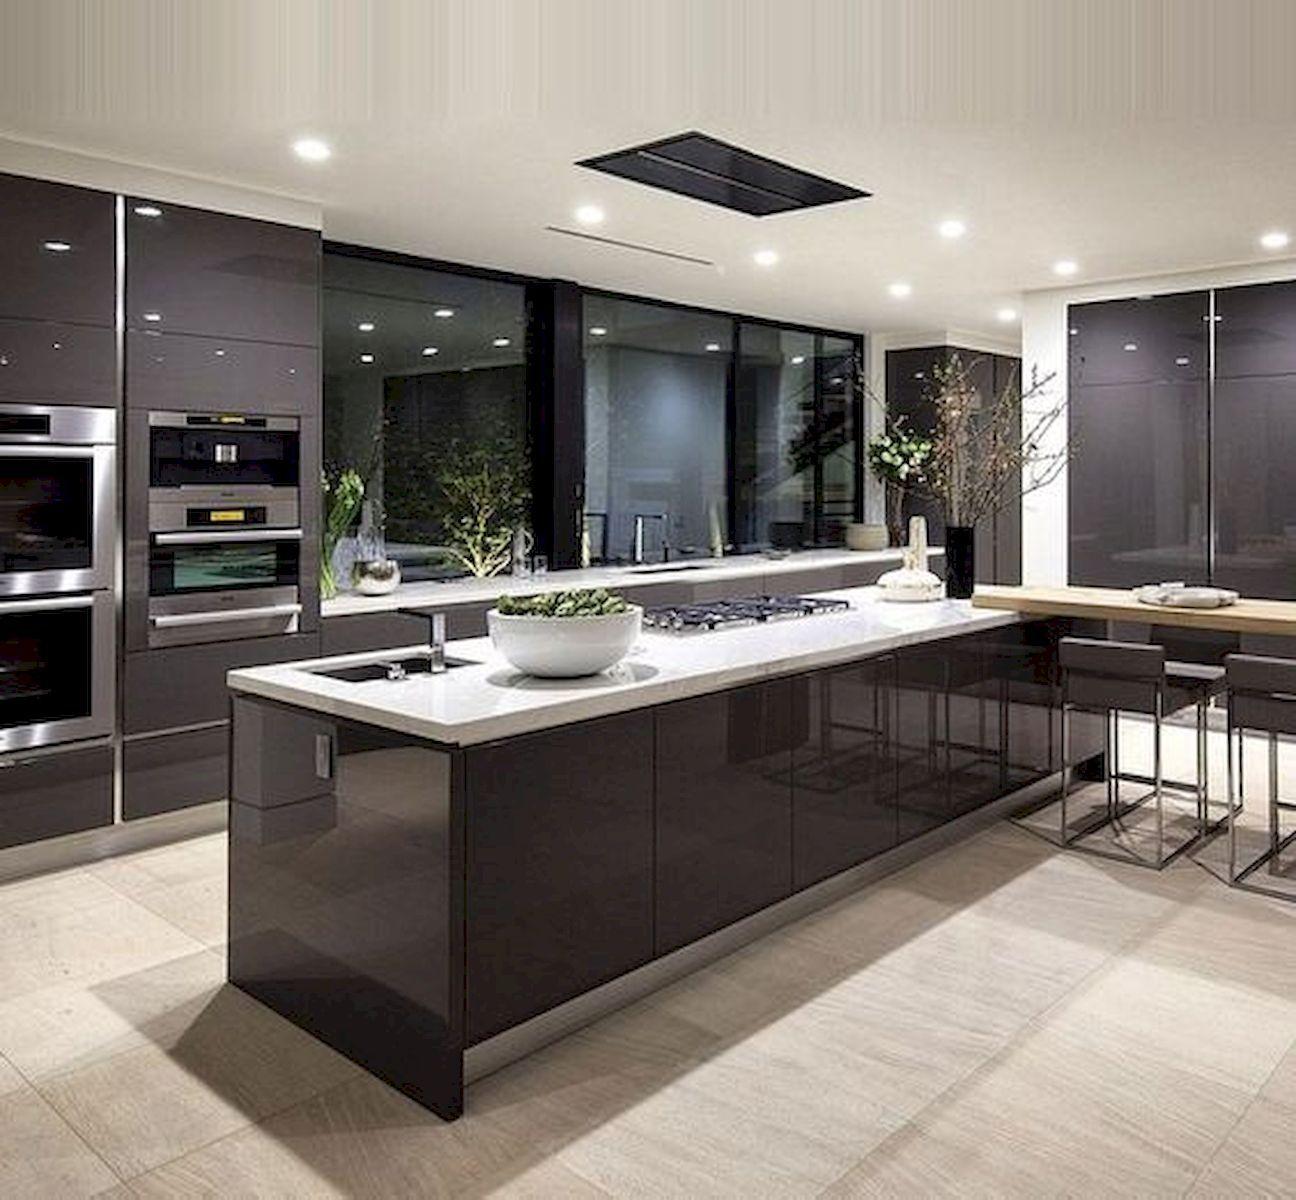 Nice 48 Luxury Modern Dream Kitchen Design Ideas And Decor Source Https Artmyideas Com Modern Kitchen Cabinet Design Dream Kitchens Design Luxury Kitchens